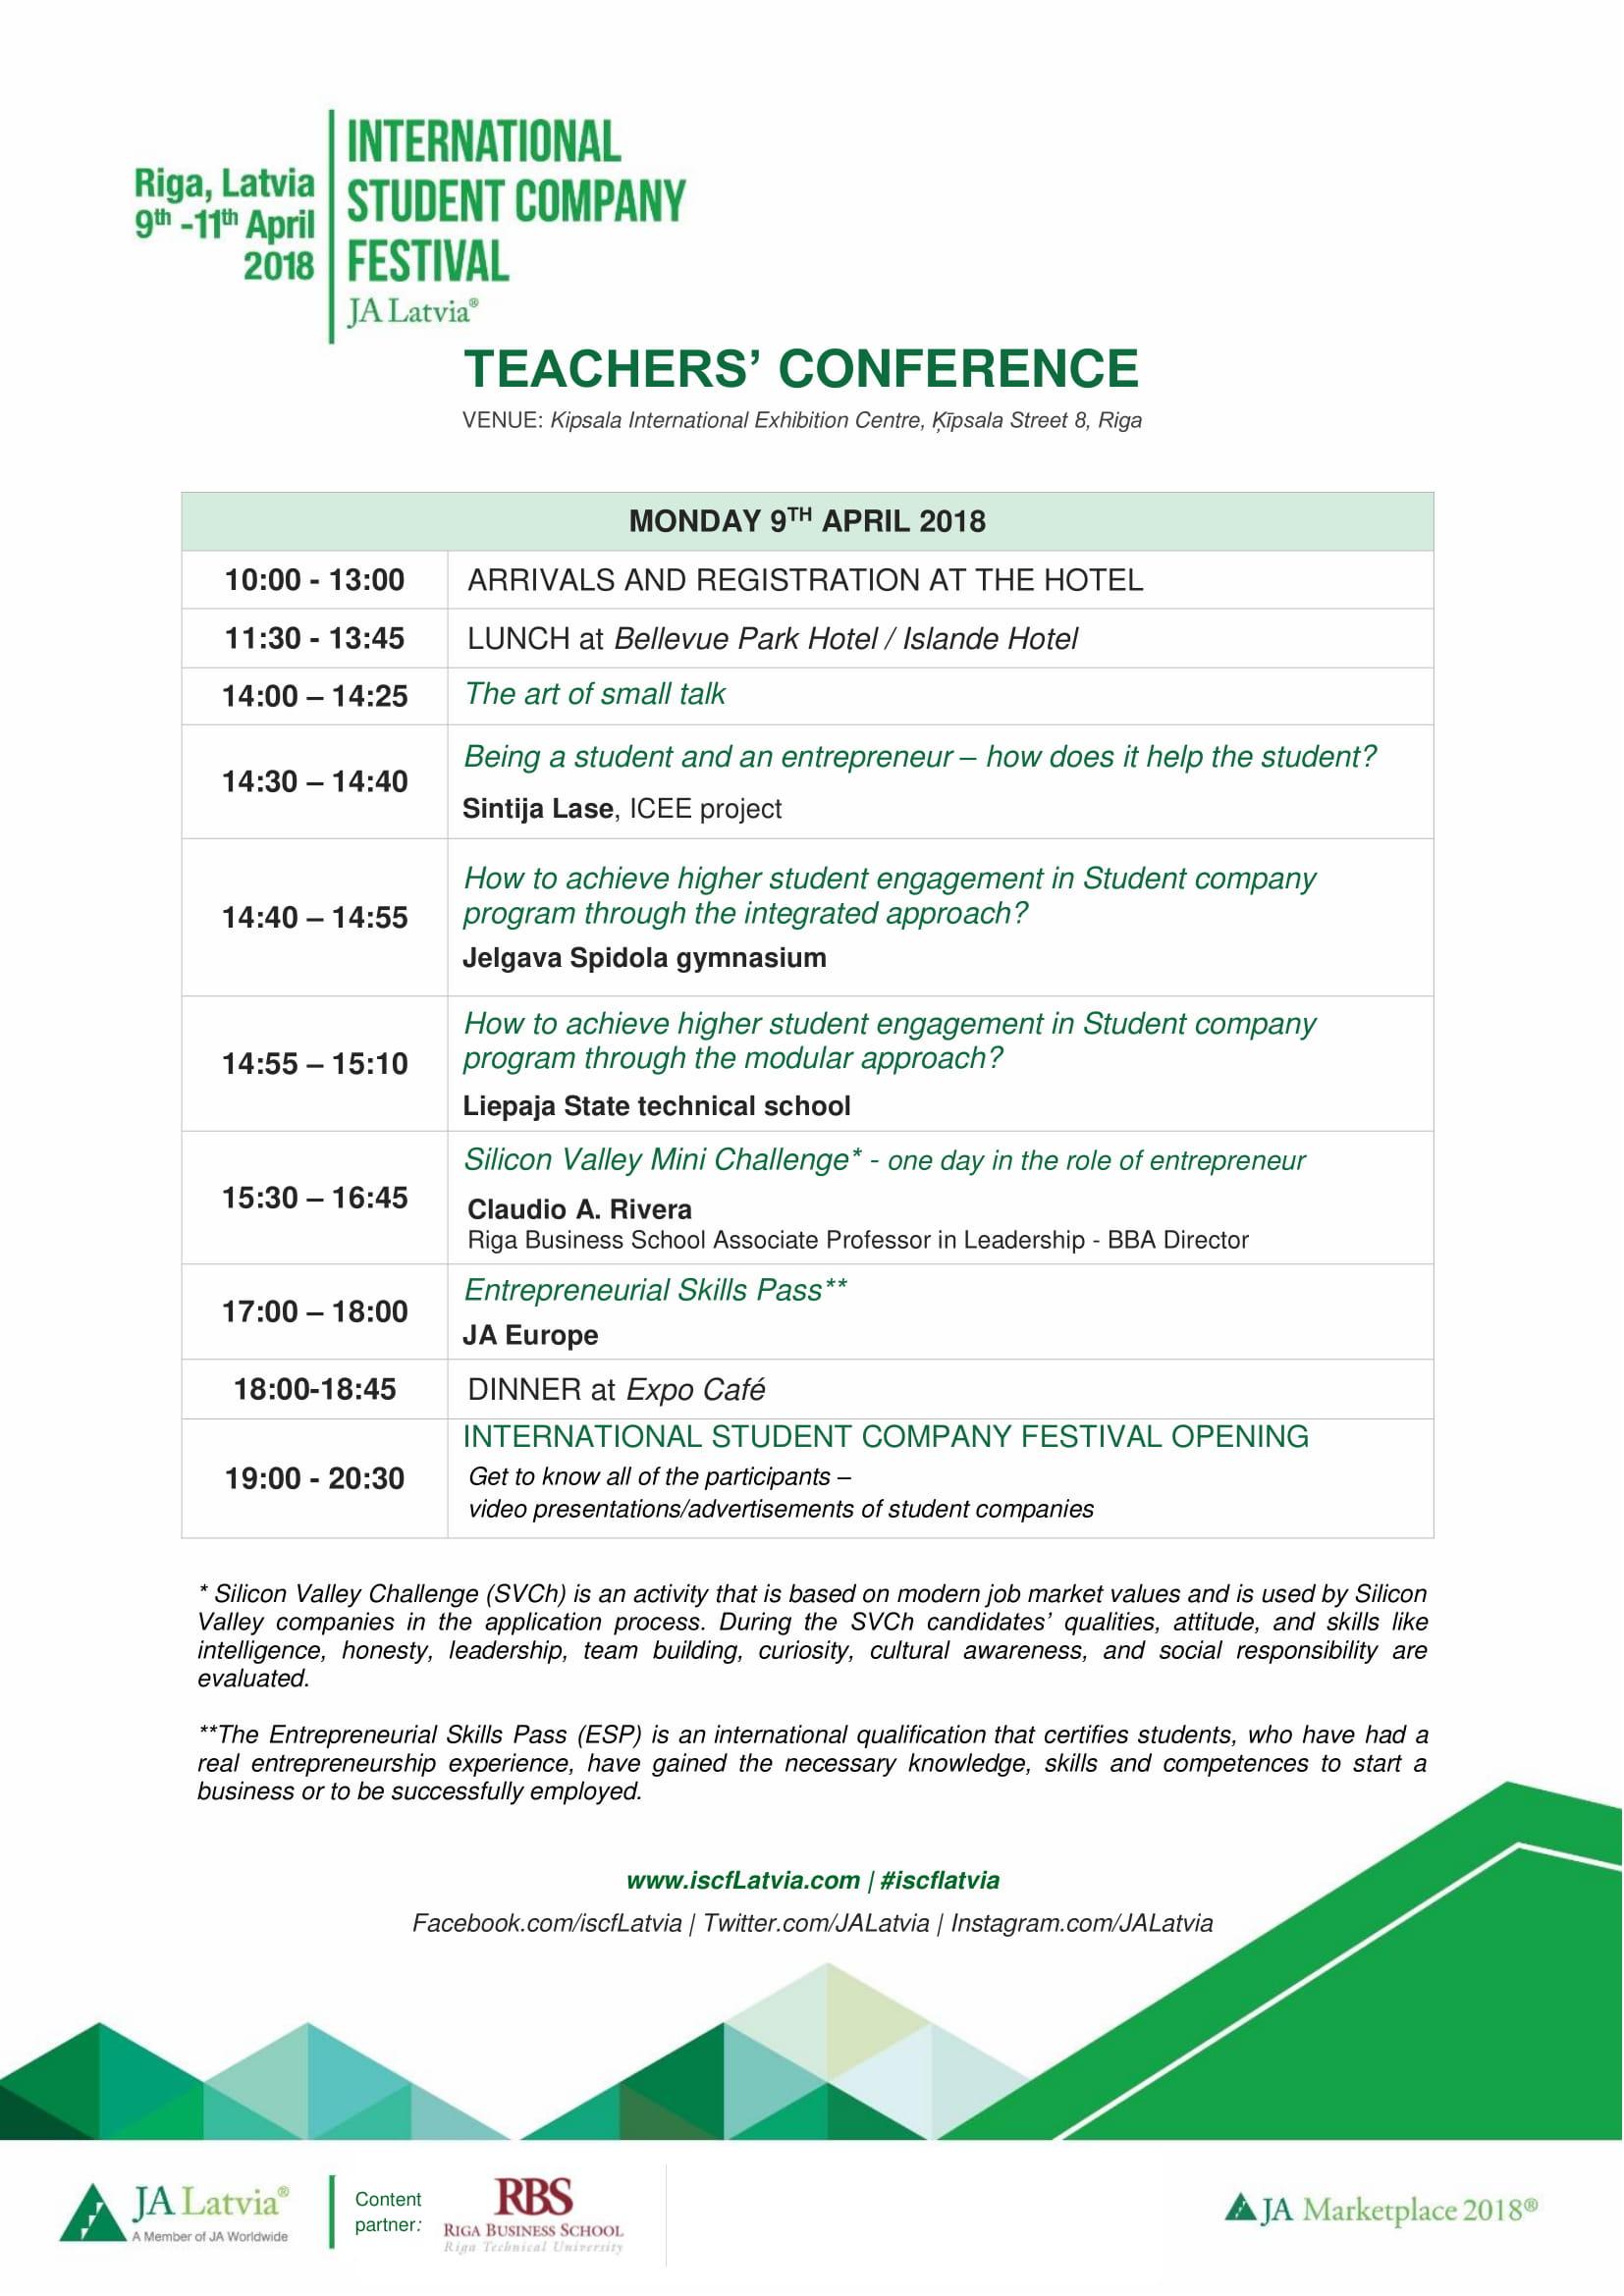 Conference agenda / News / iscflatvia